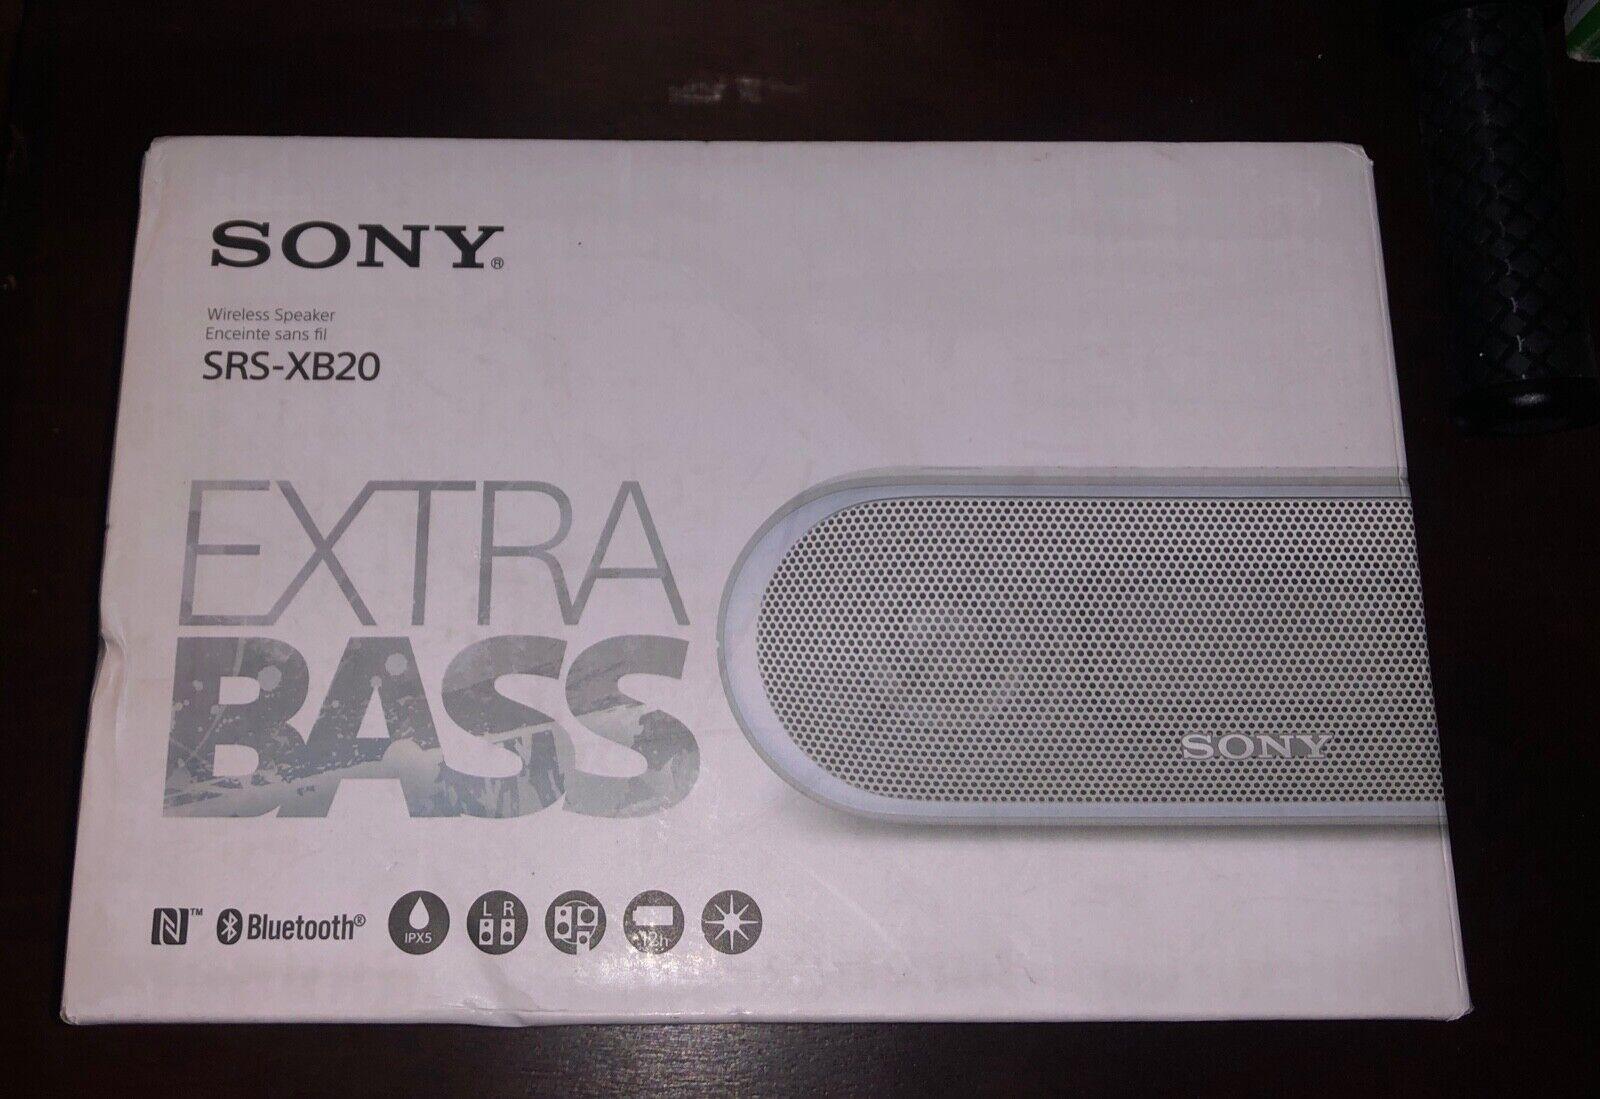 Light Grey Sony XB20 LED Bluetooth Wireless Speaker SRS-XB20 2017 Model Box